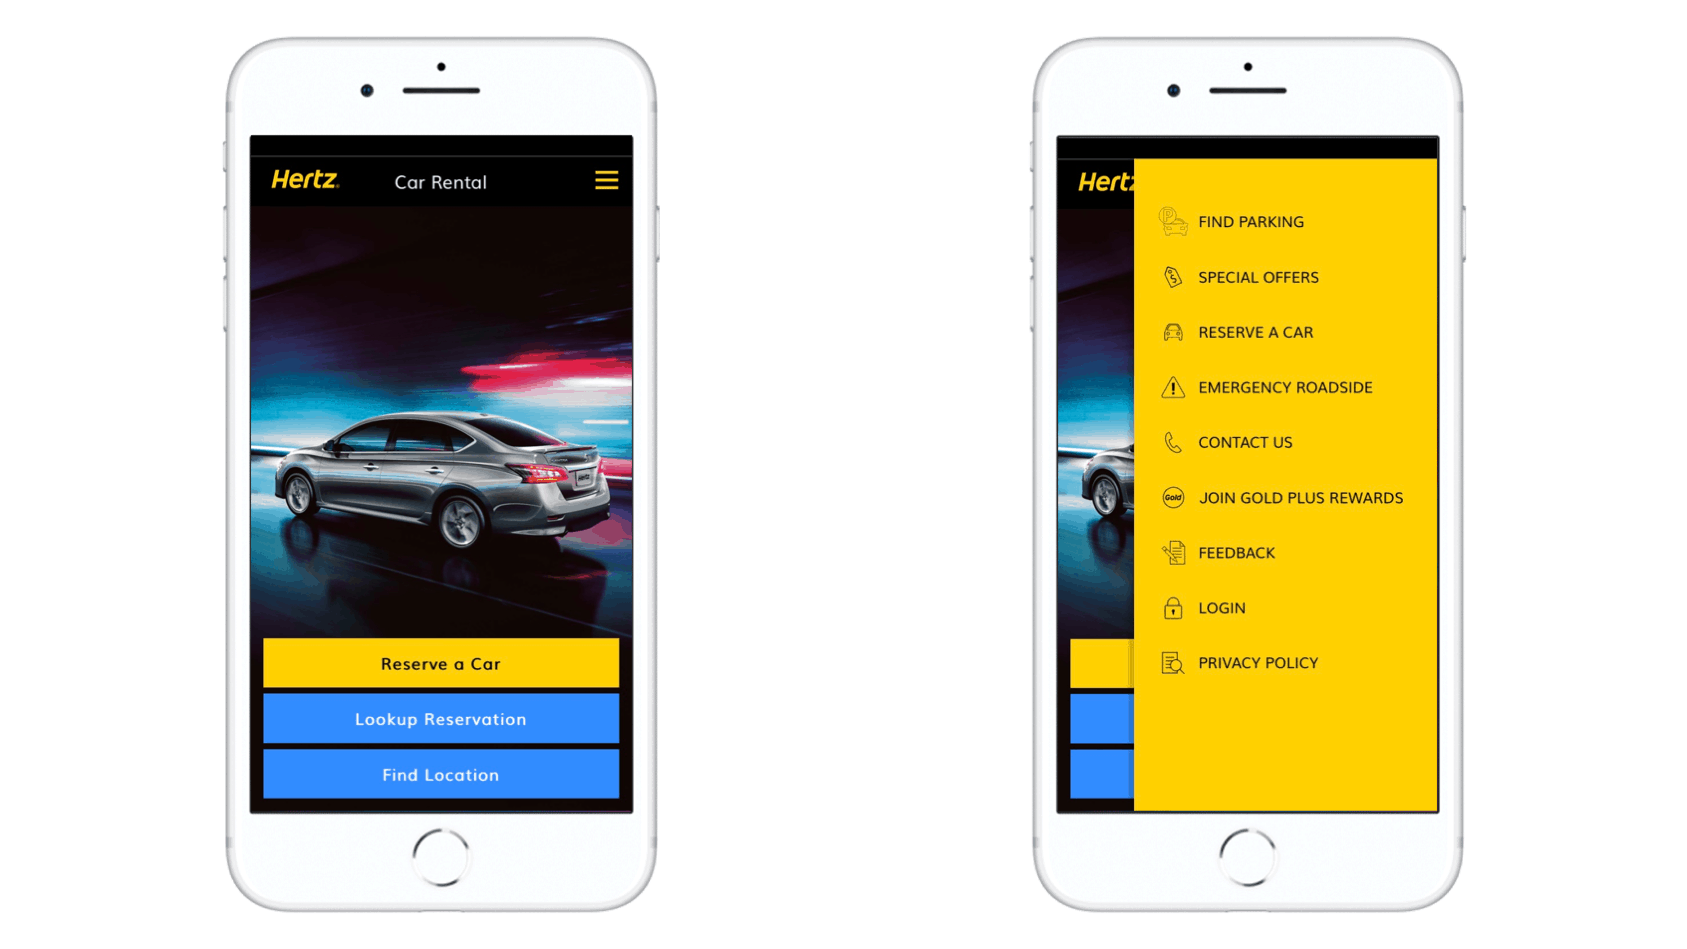 Hertz car rental mobile application home page screenshot